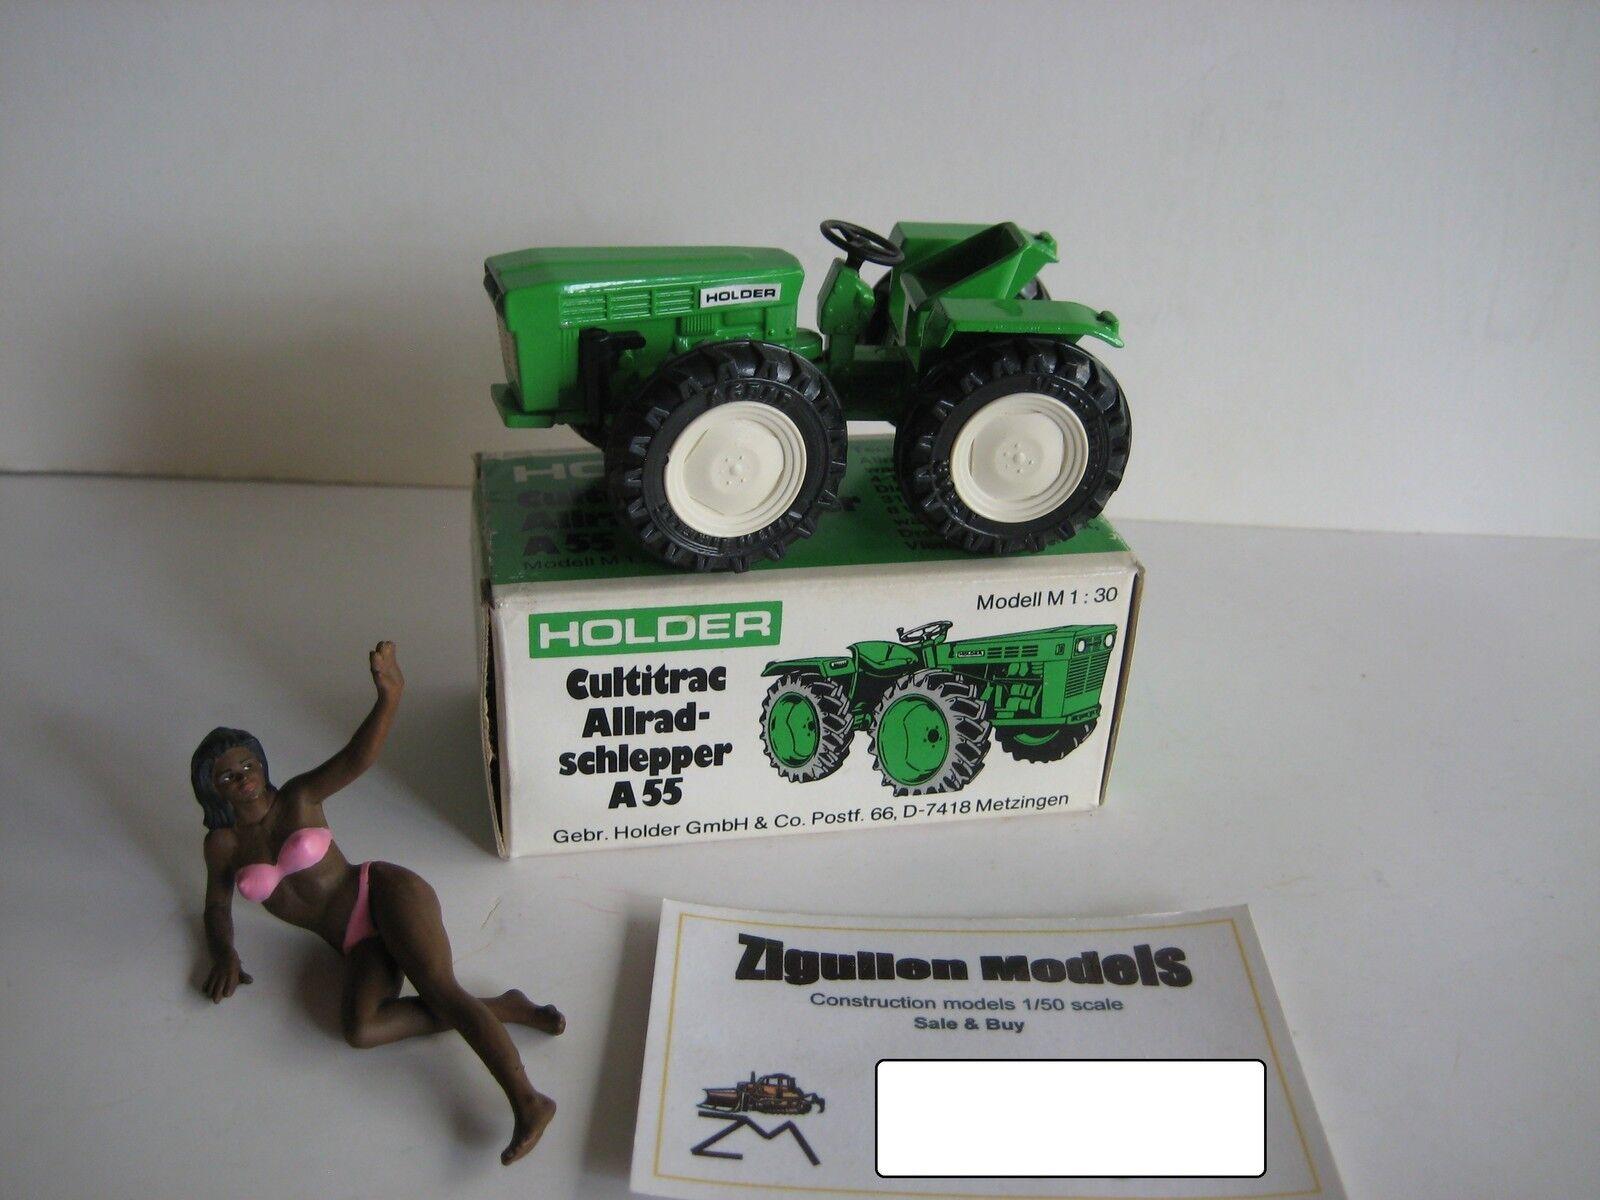 Holder a 55 roues Pli articulaires tracteur  1076 Curseur 1 30 neuf dans sa boîte RAR